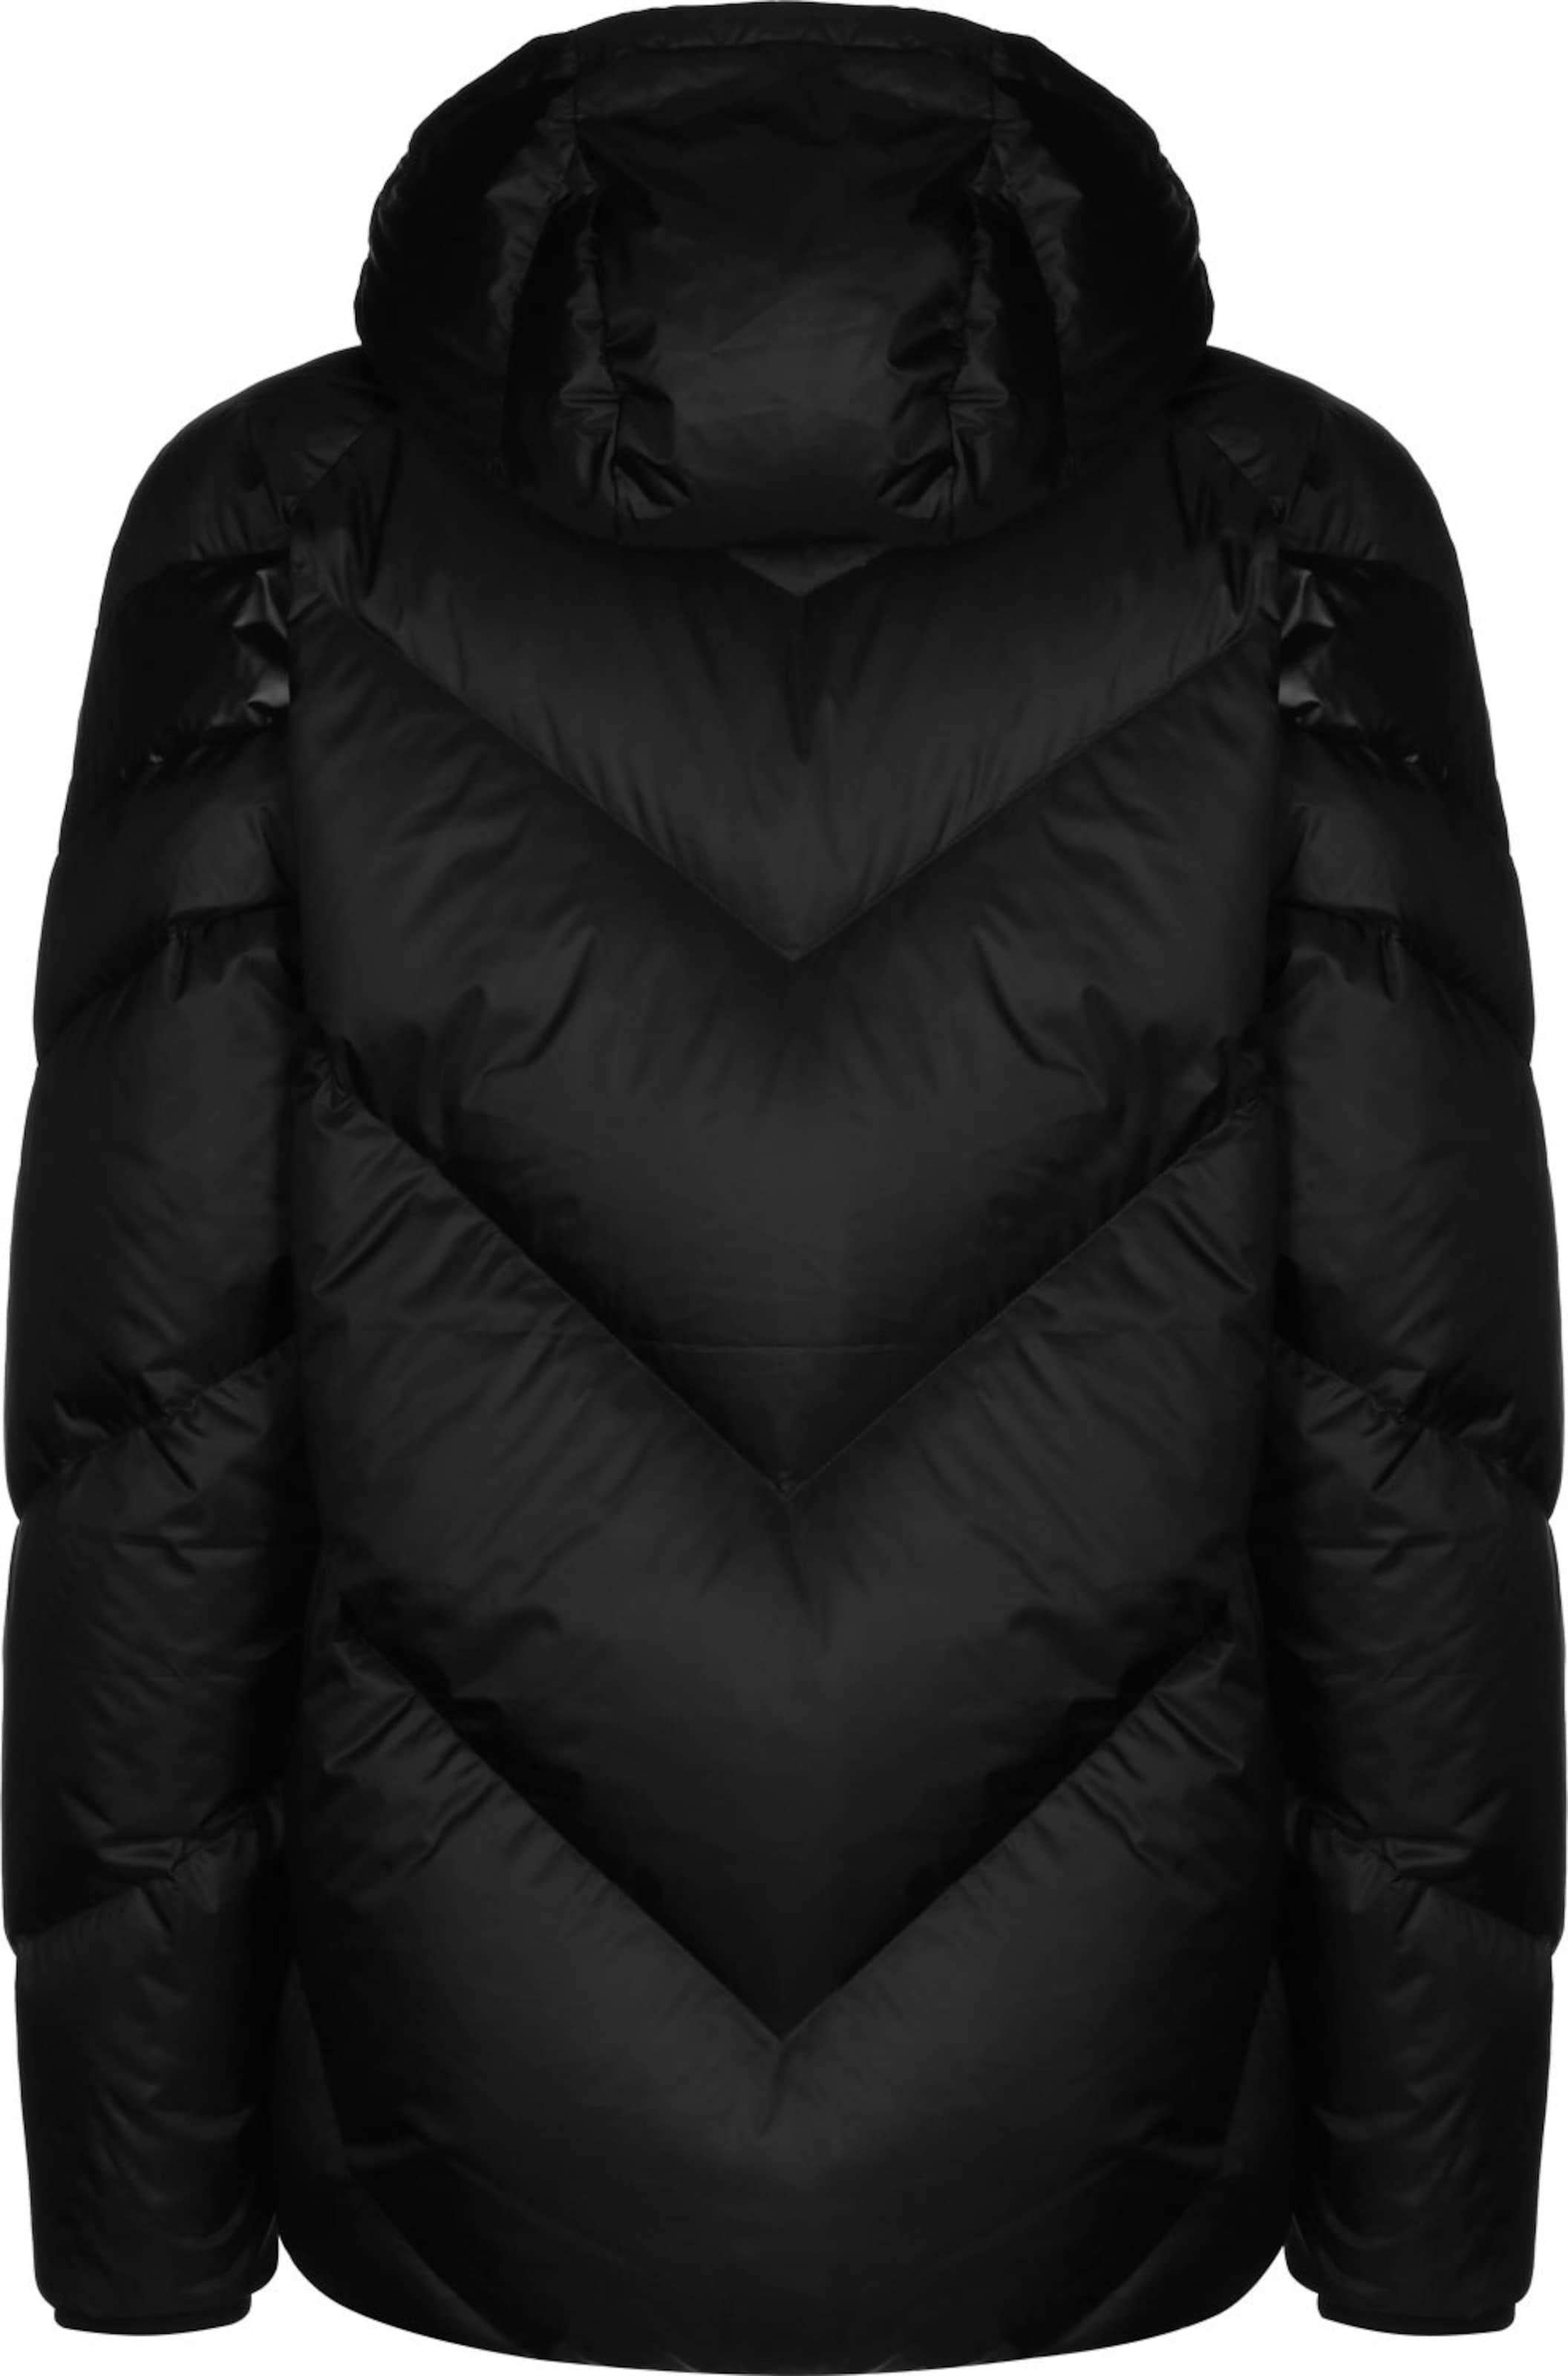 PUMA Daunenjacke ' MCS Shiny Puffer ' in schwarz Warm gefüttert KJ39697011